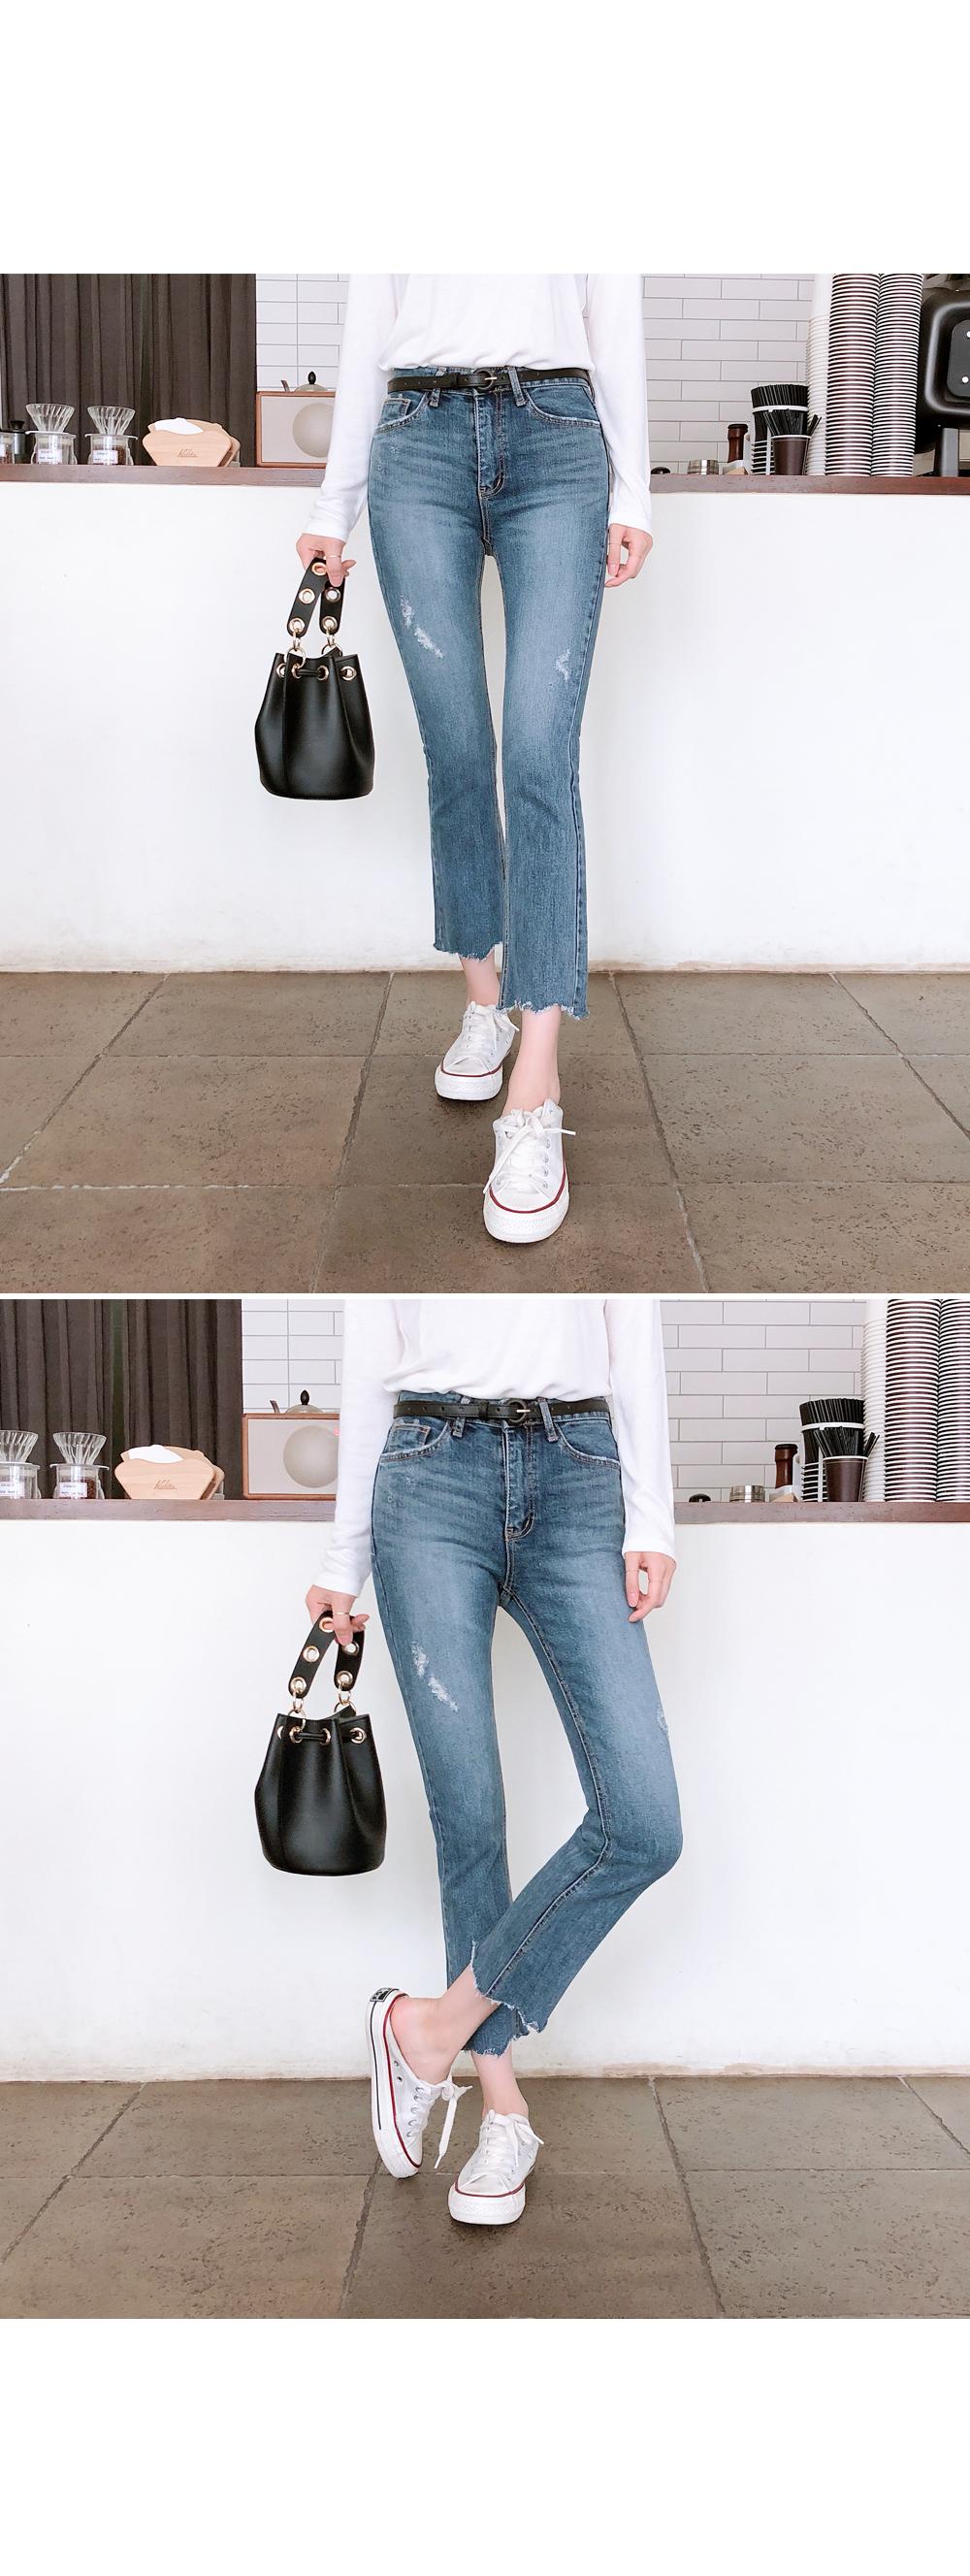 Pelvic line pretty pants